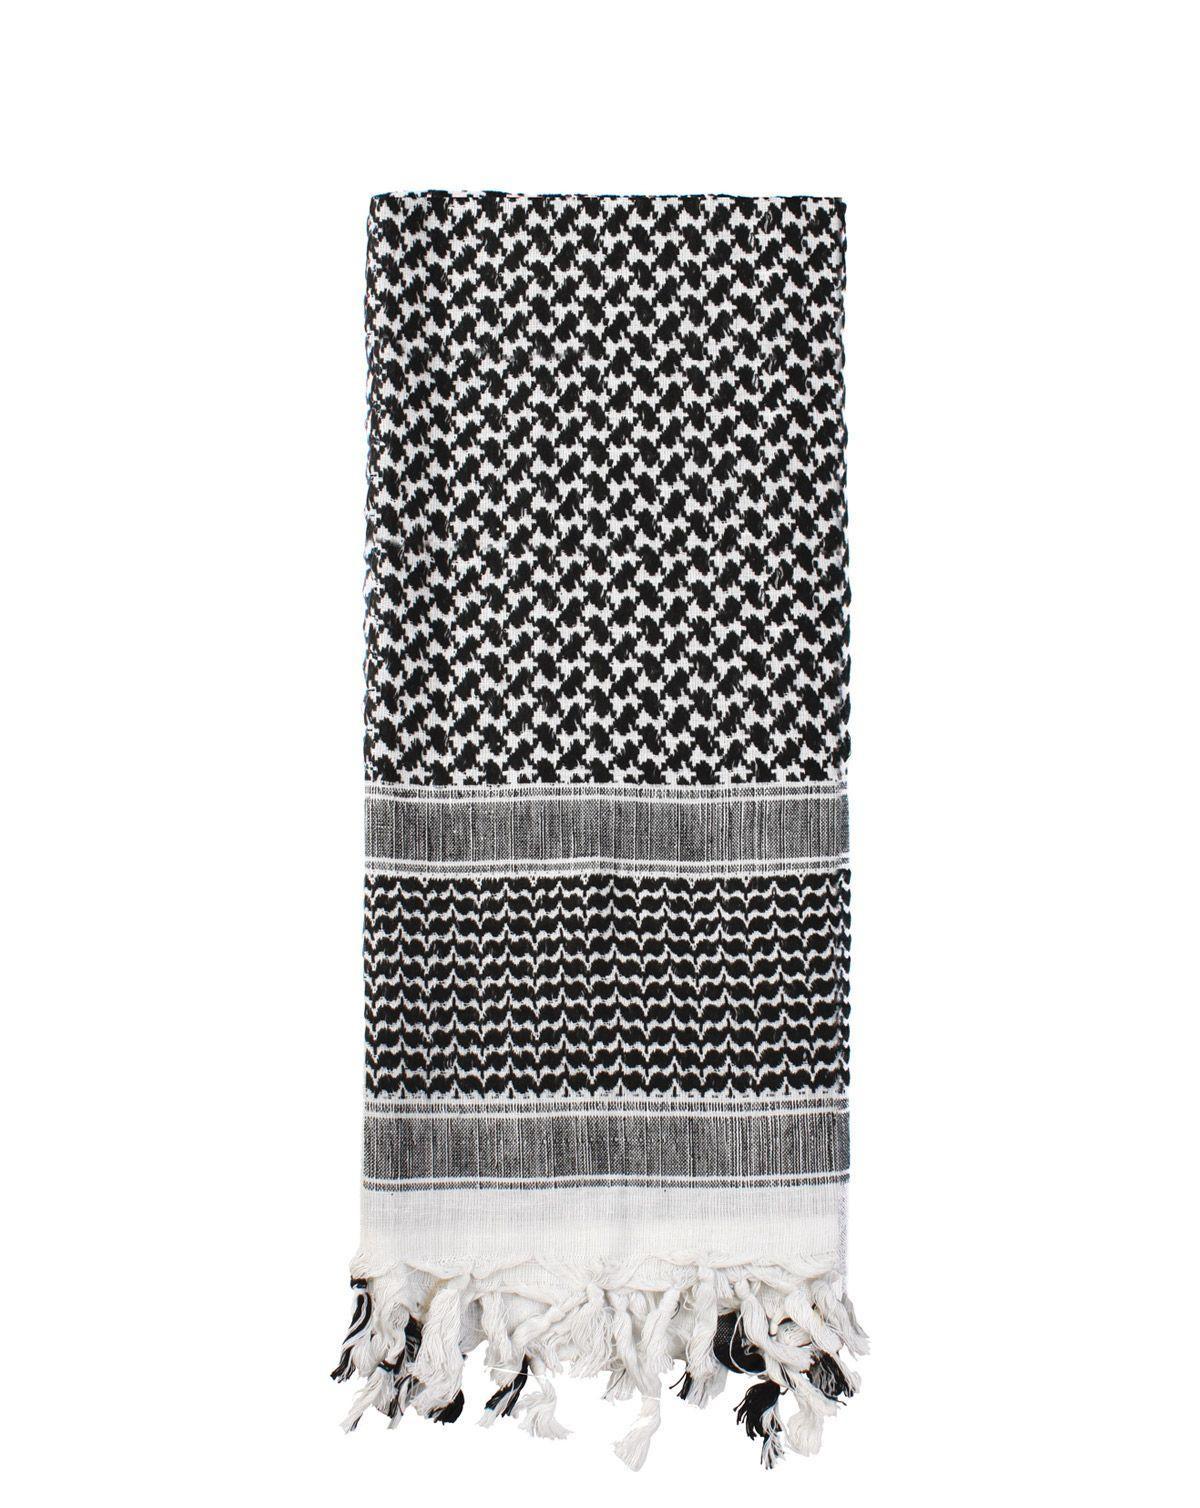 Image of   Rothco Deluxe Partisan Tørklæde (Sort / Hvid, One Size)